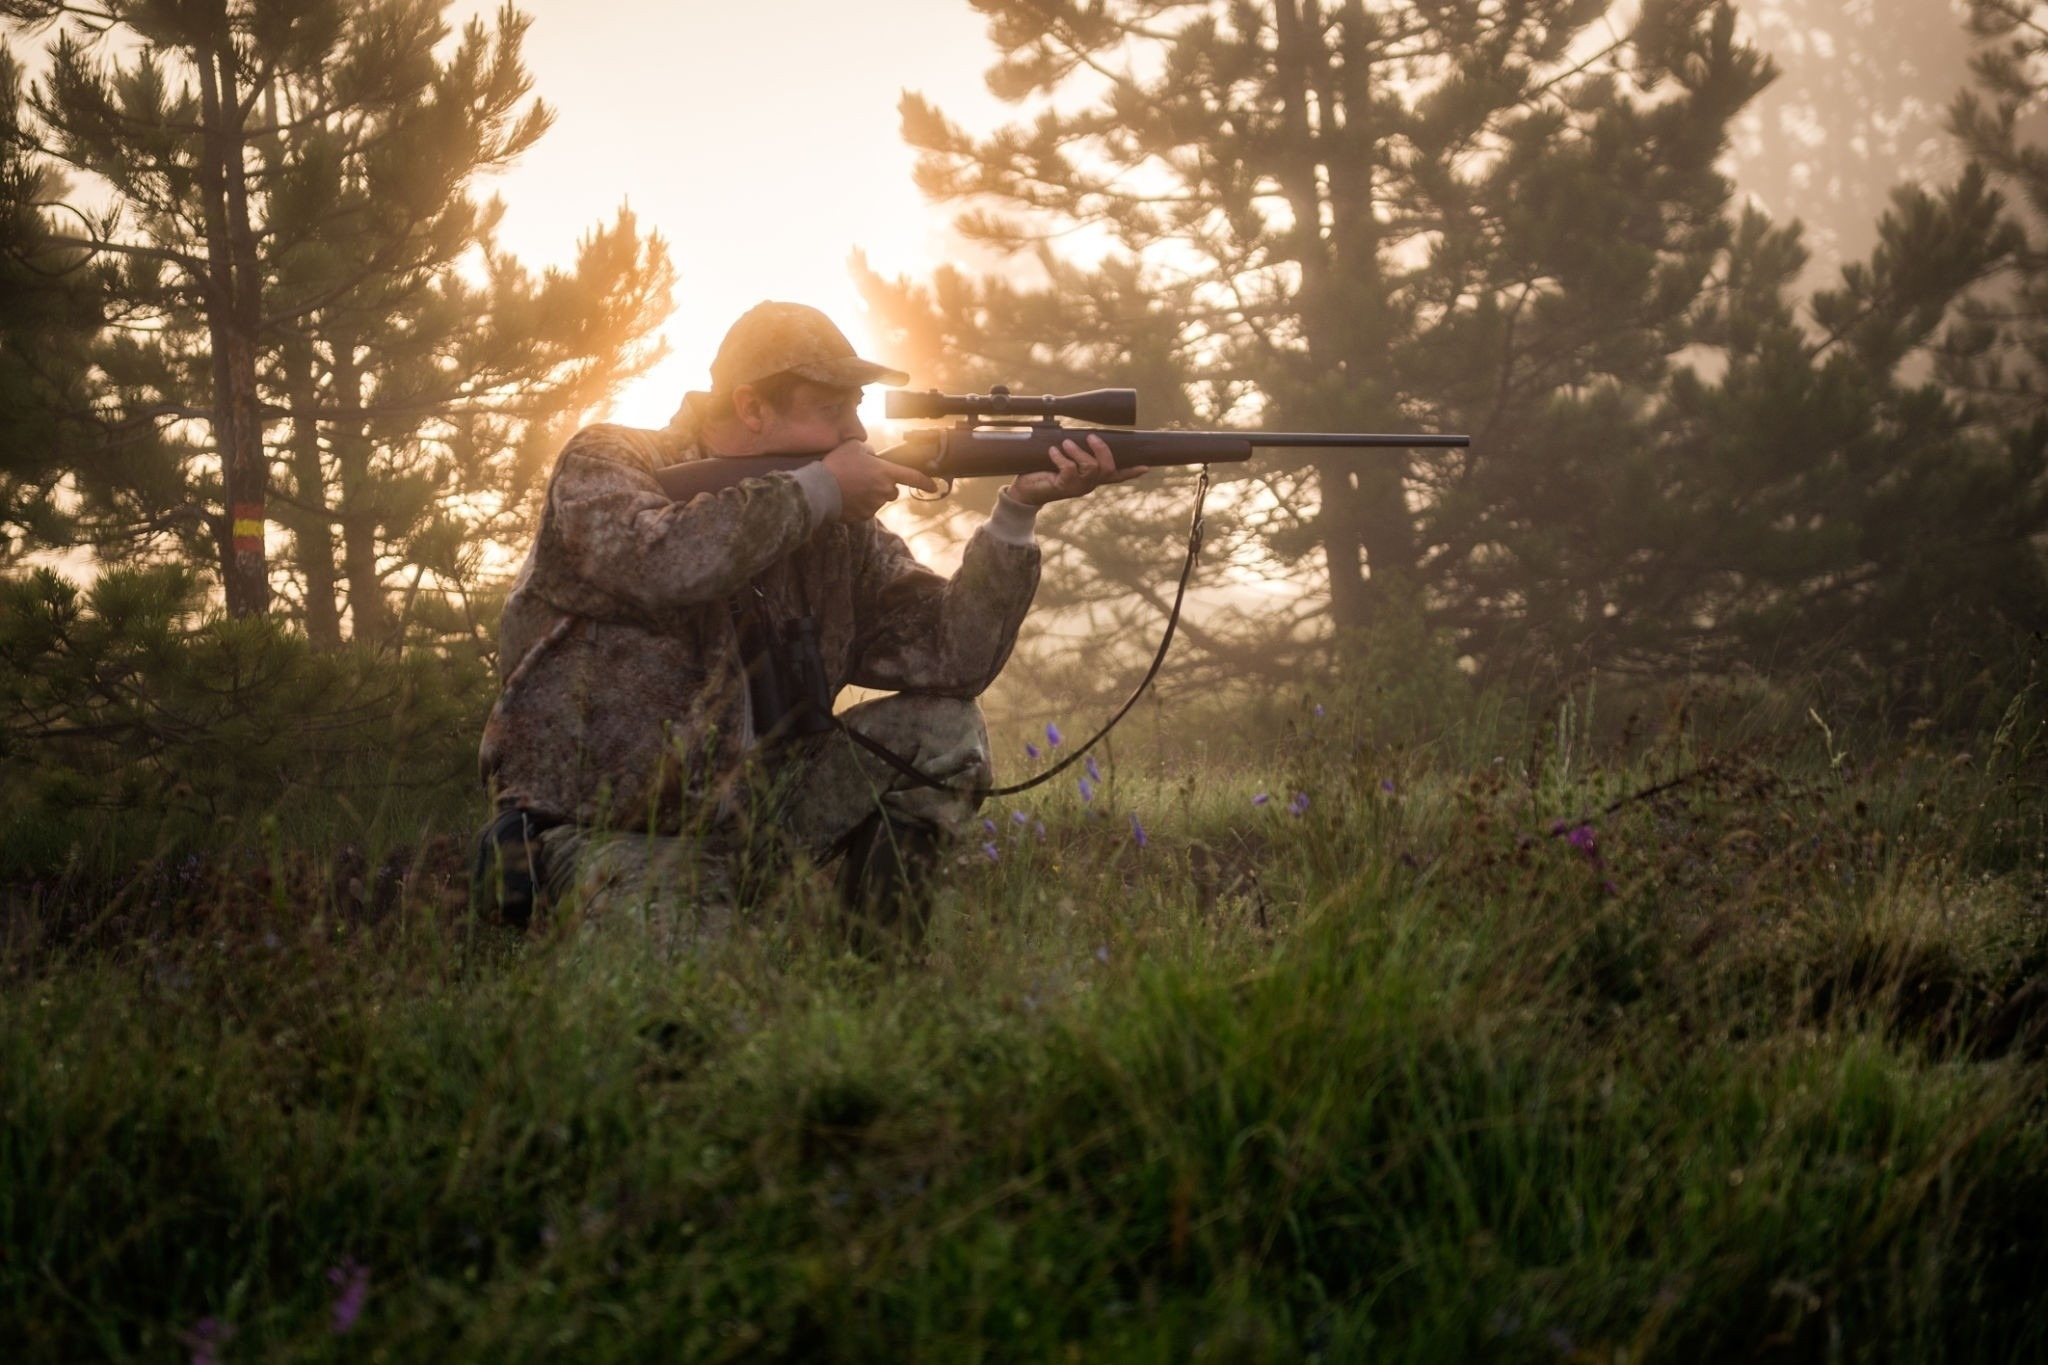 Why Do People Like Hunting